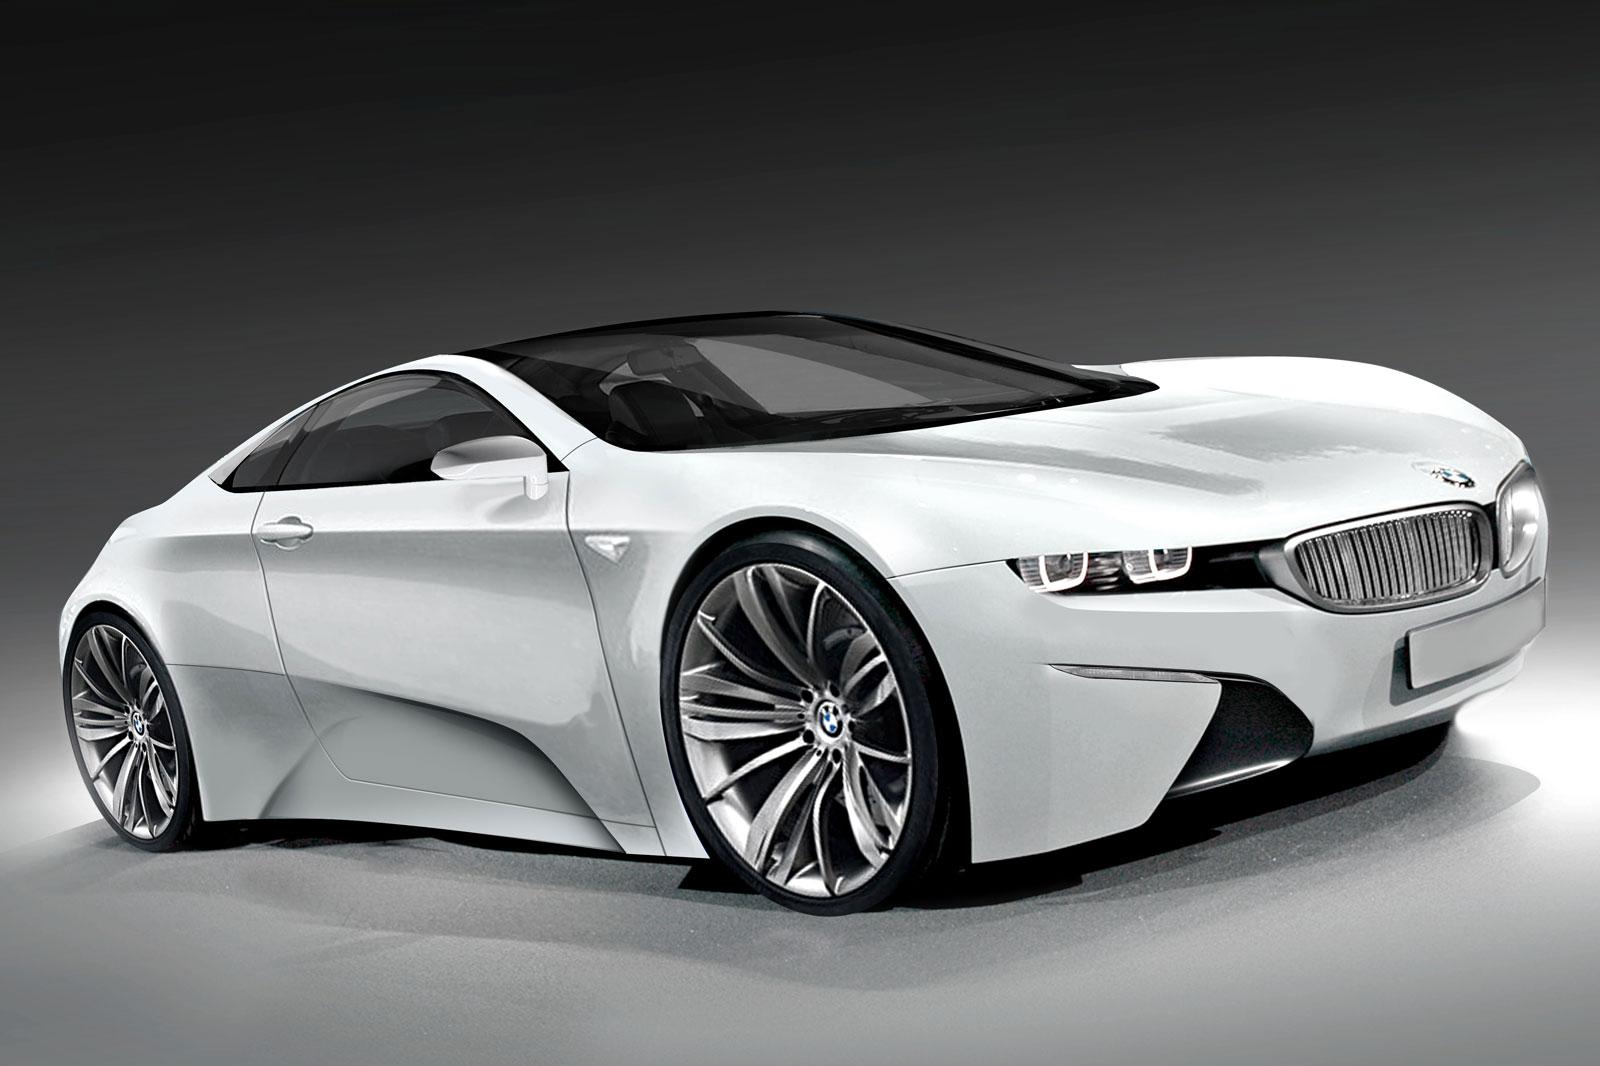 Cars Latest Cars Sports Cars New Cars Bmw X6 2012